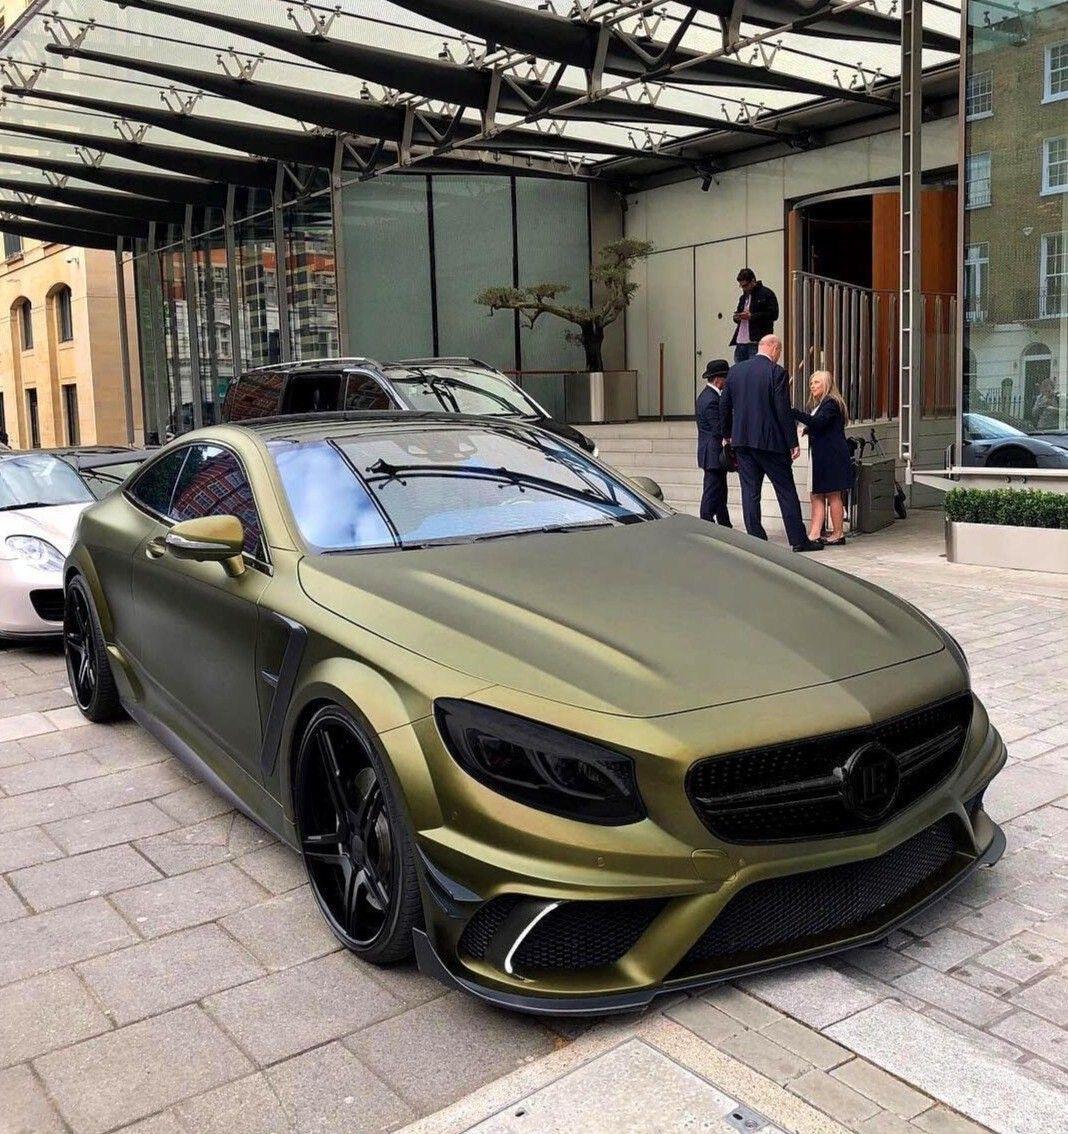 Best Luxury Cars, Mercedes Benz Amg